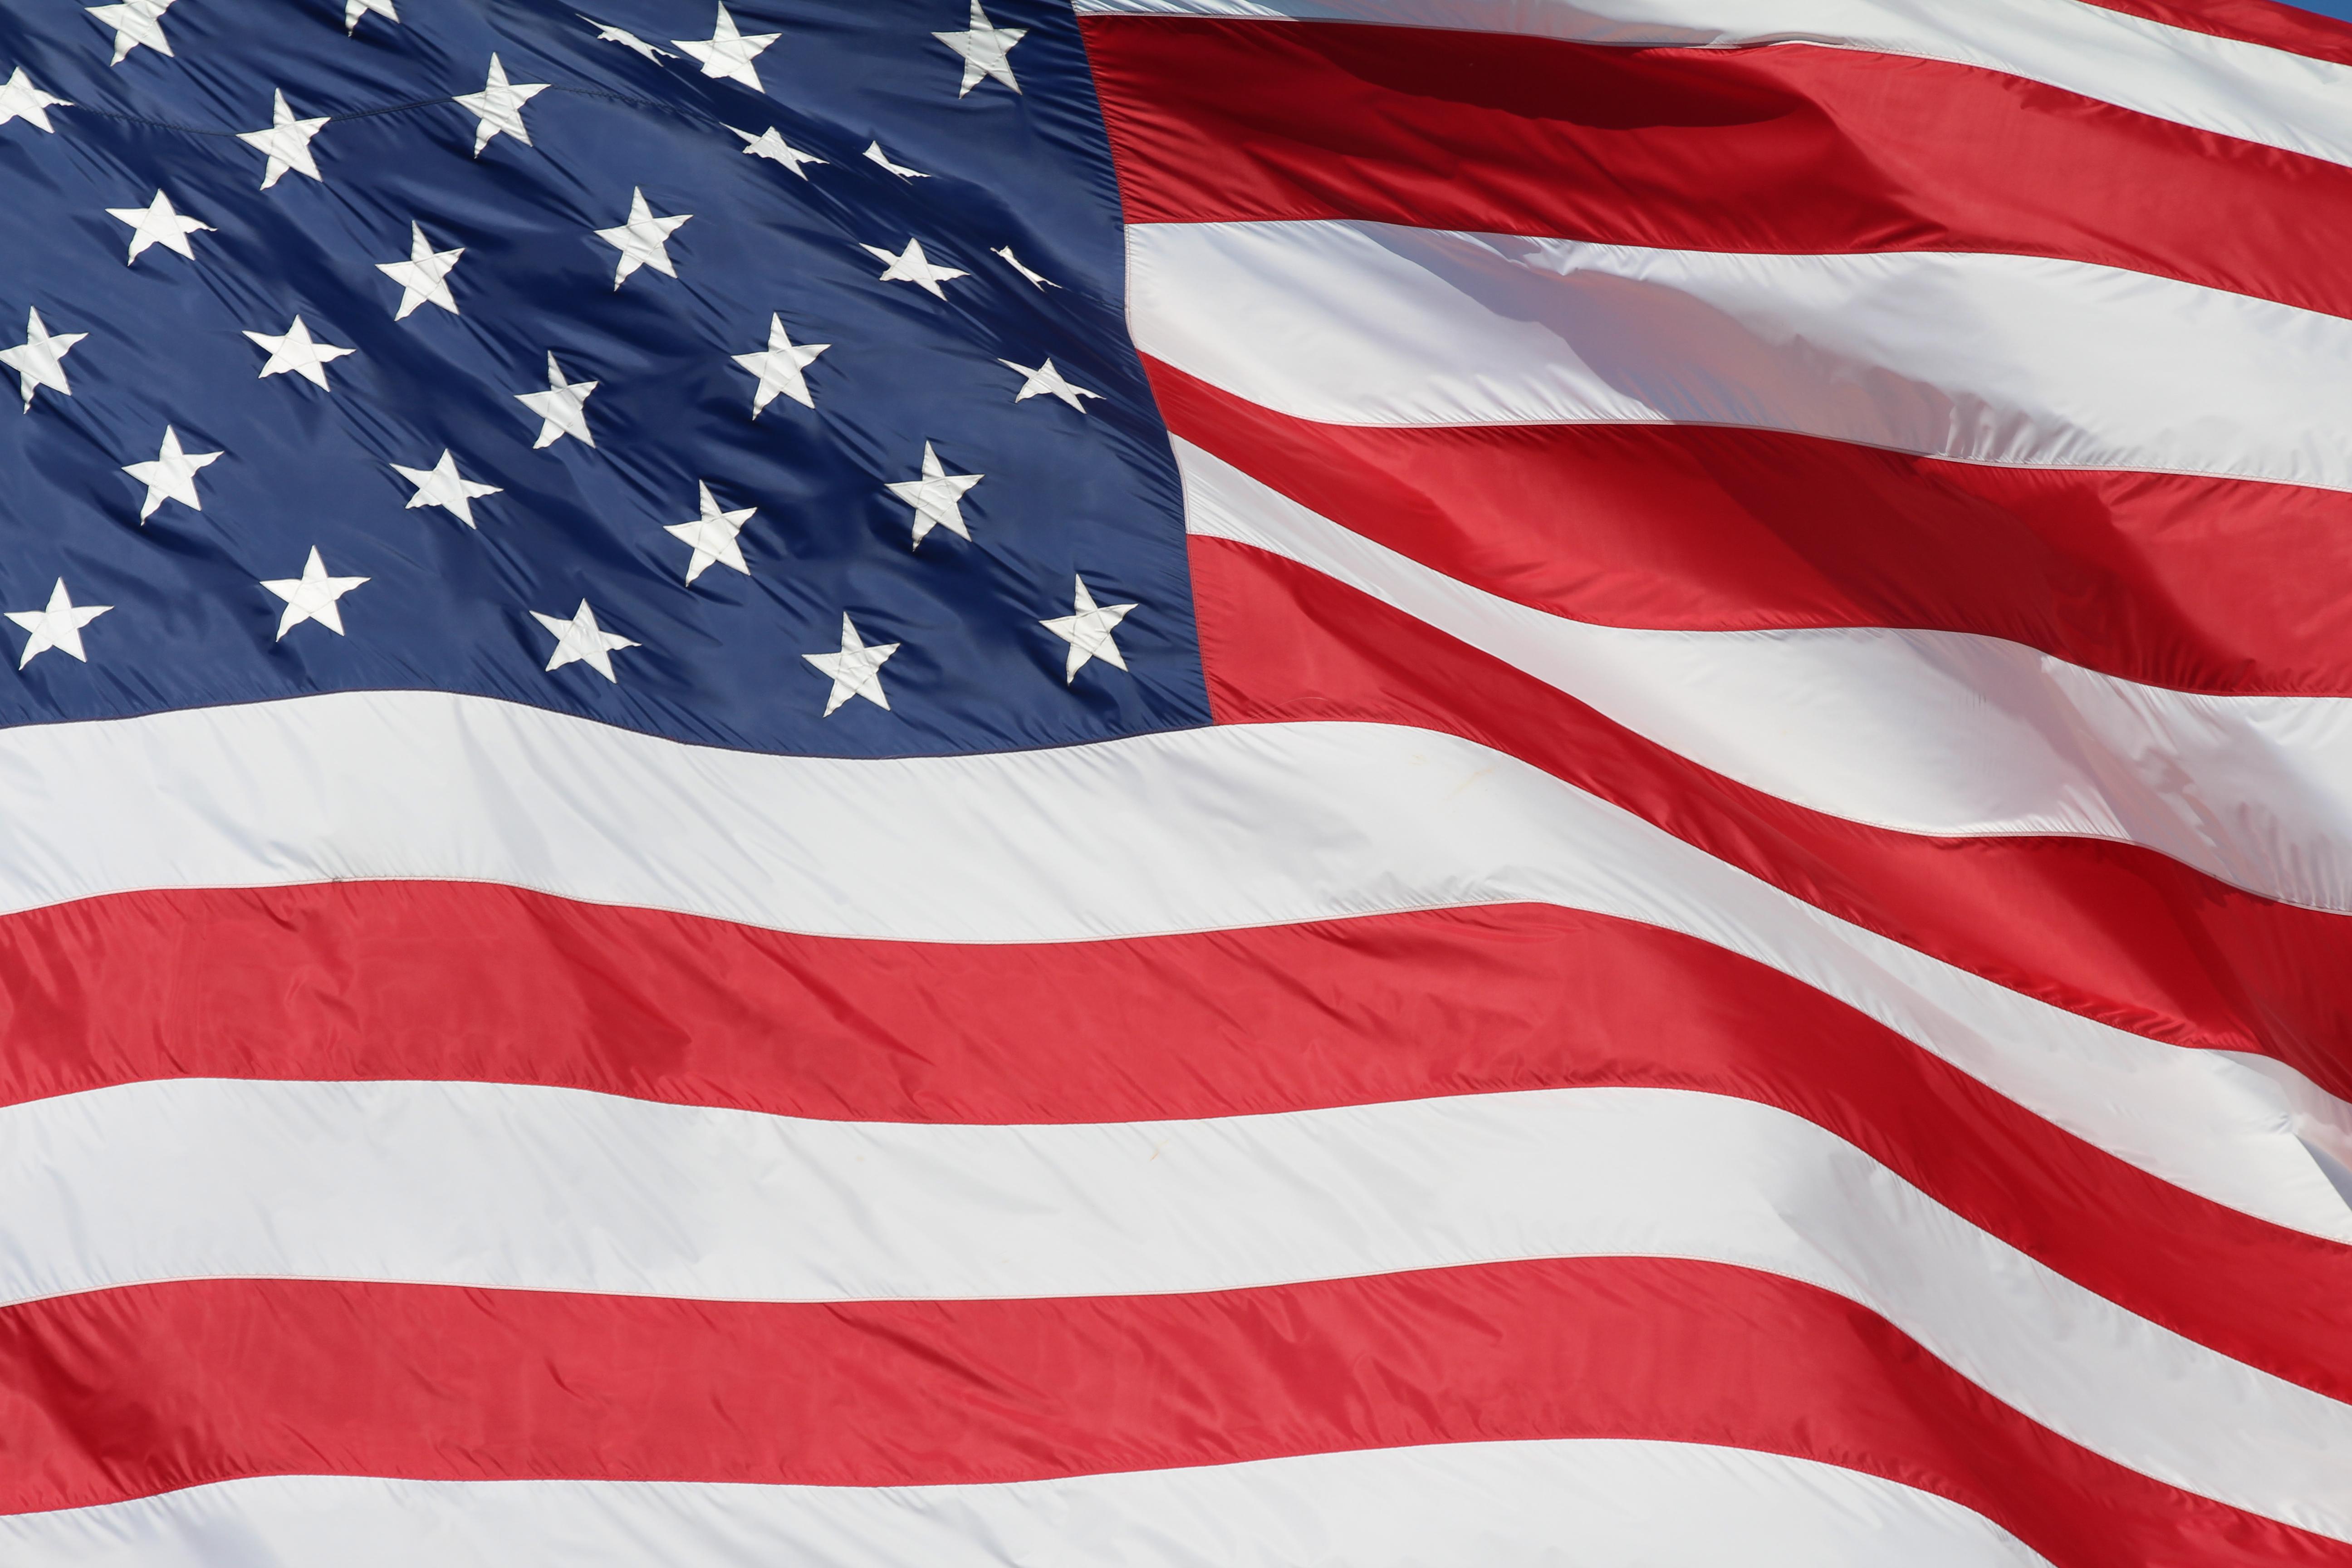 Flag Background 5184x3456